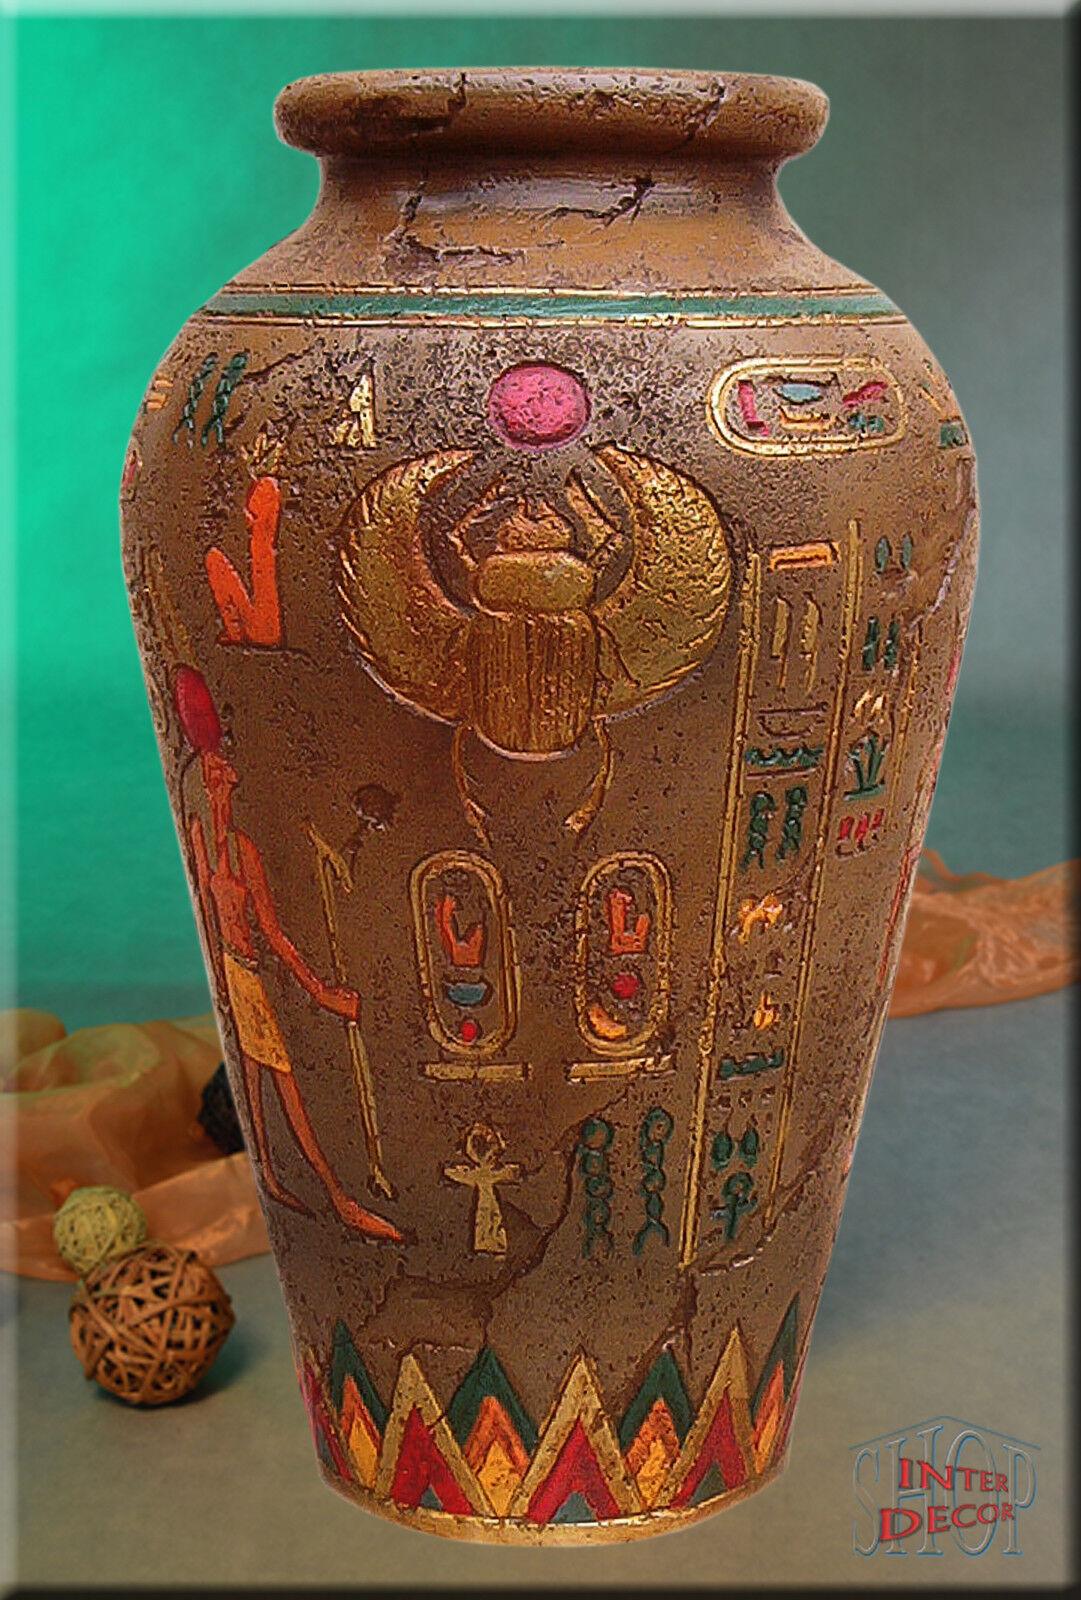 Bodenvase Amphore Vase Blaumenvase Pflanzenvase Ägyptisch Kunstharz